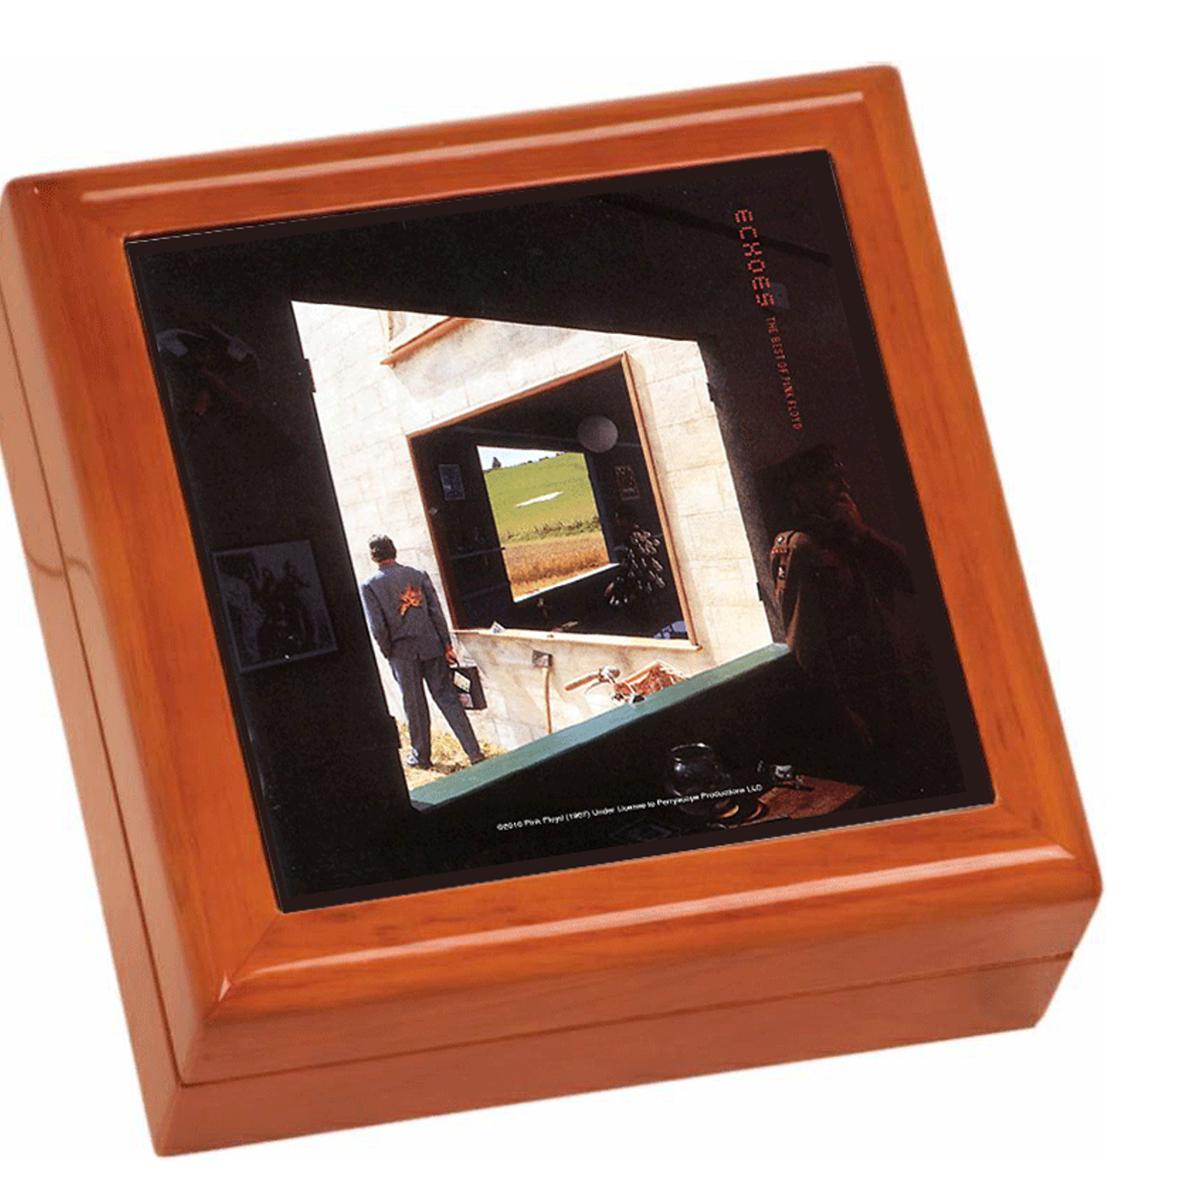 Echoes Wooden Keepsake Box